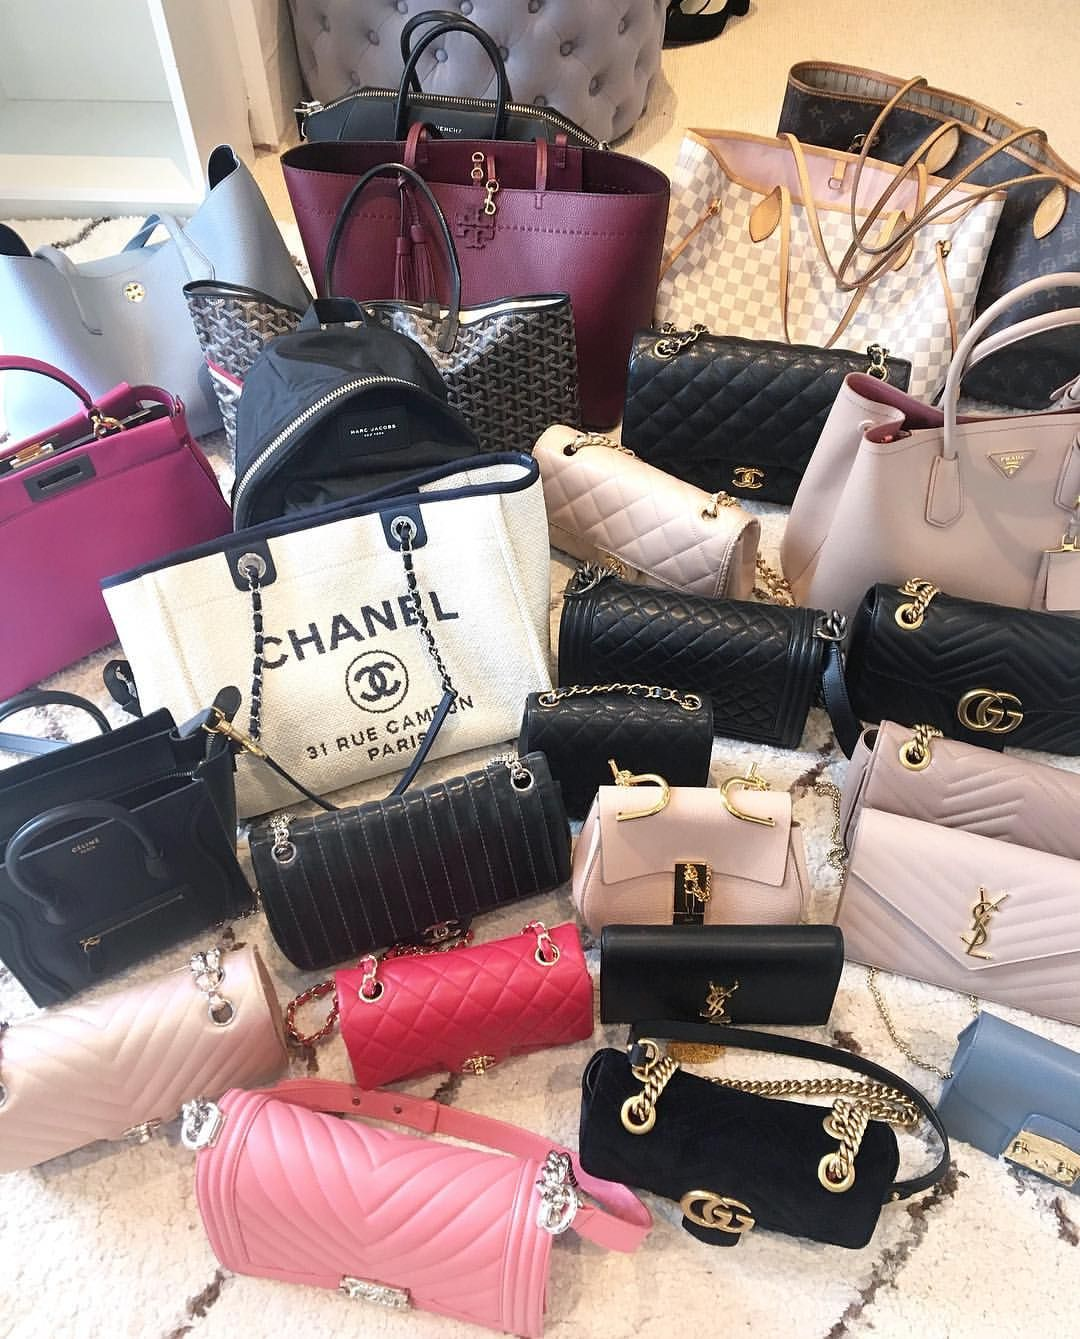 f99e0aeef8c9 A new video is up on my channel! My complete bag collection